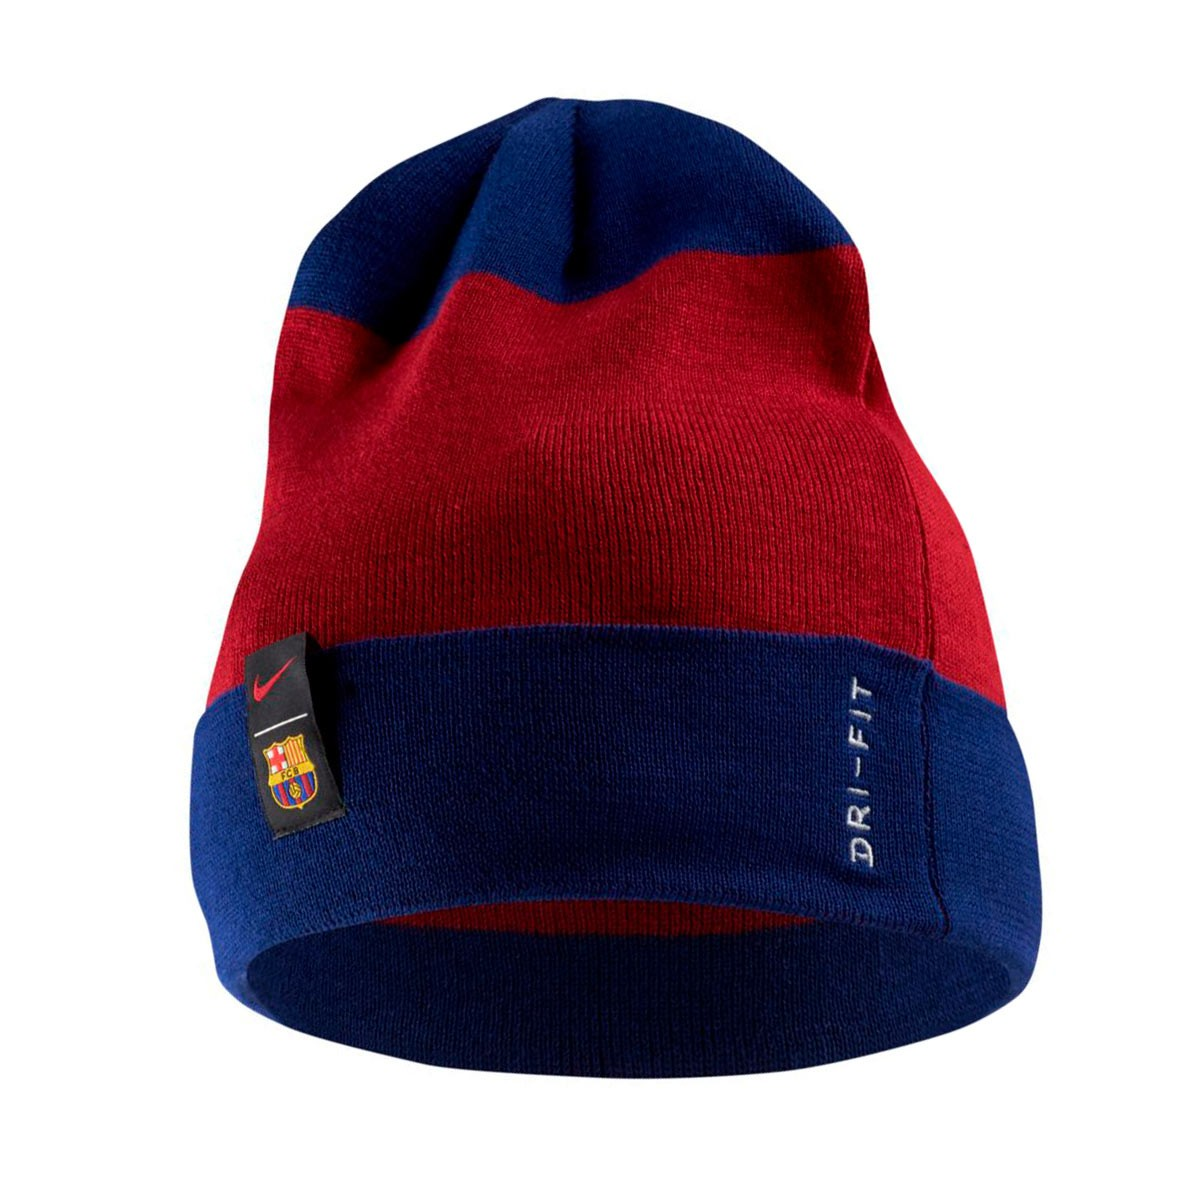 new style 270af ad3e5 Nike FC Barcelona Beanie 2018-2019 Beanie. Noble red- Deep royal blue ...